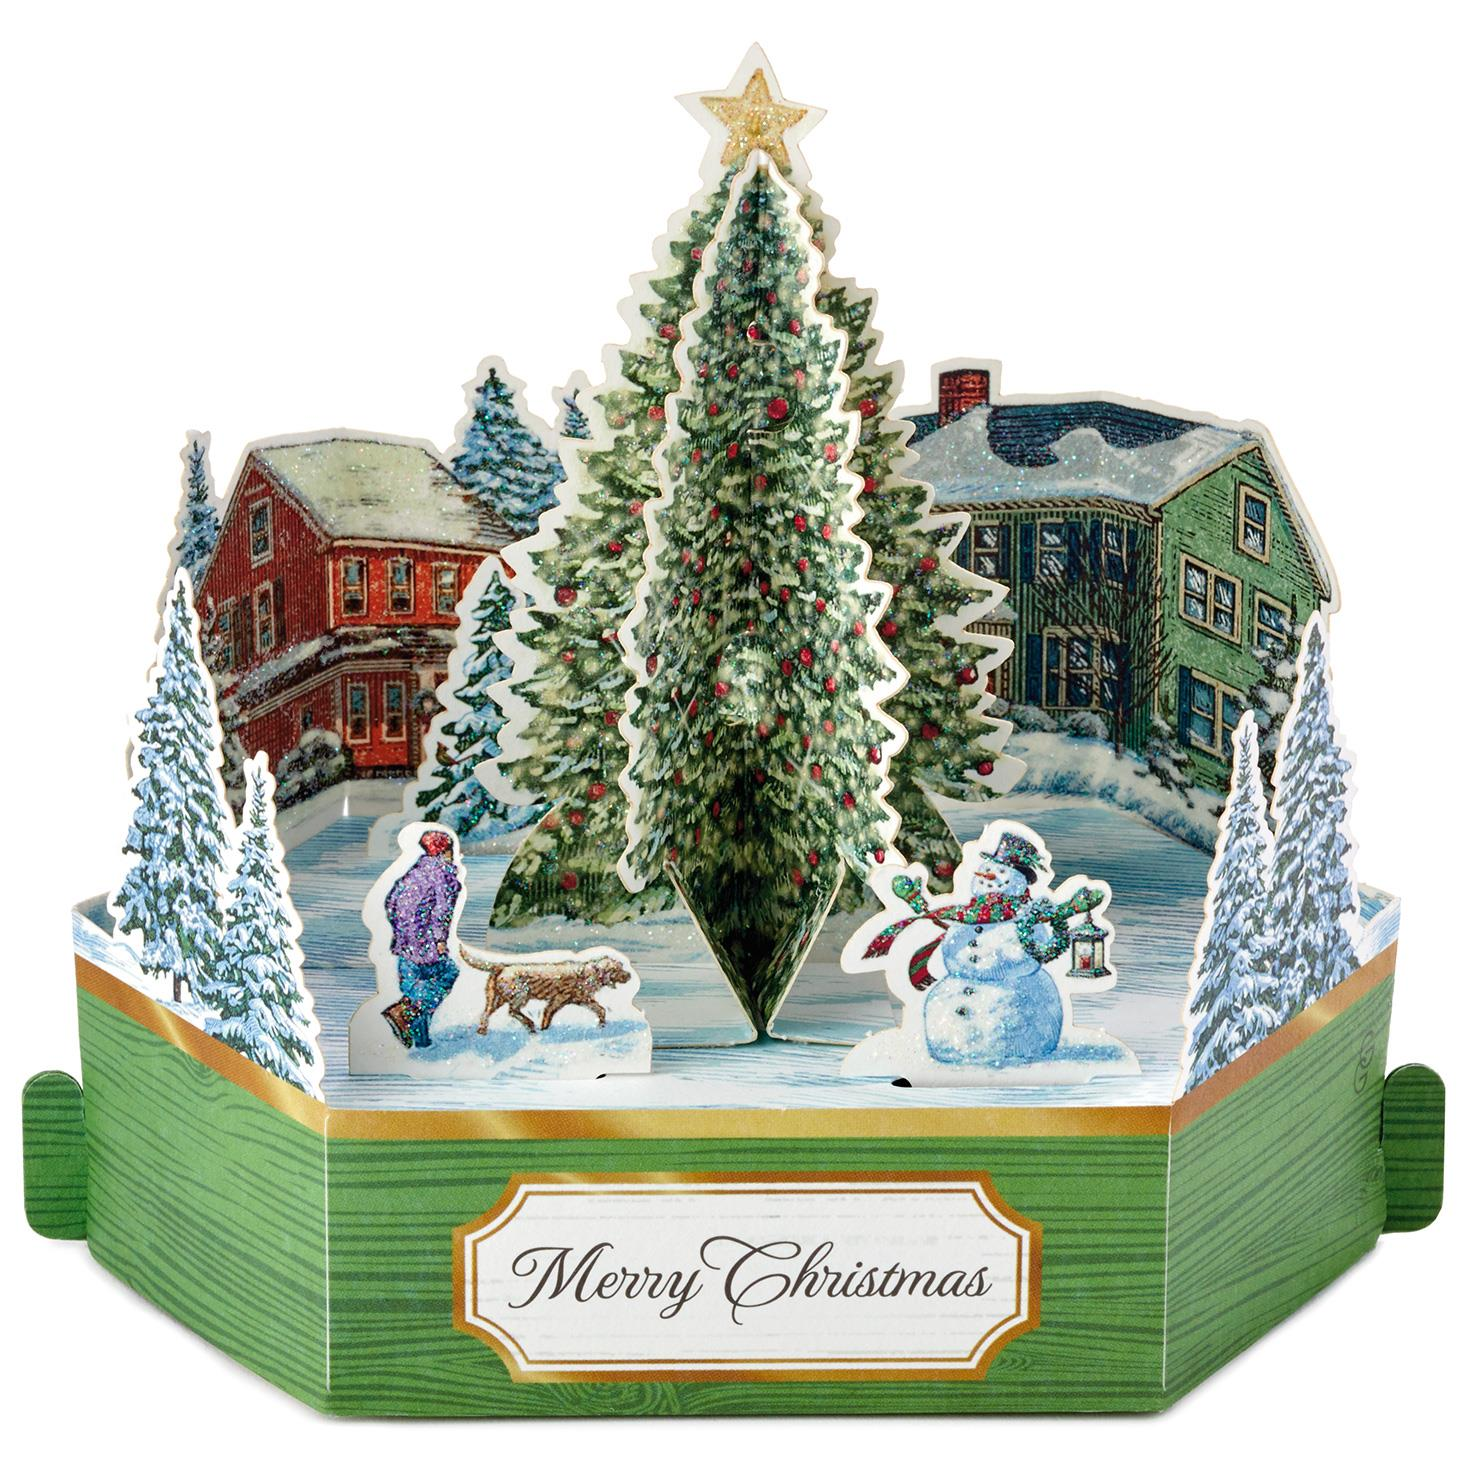 Merry Christmas Tree Mini Pop Up Christmas Card - Greeting Cards ...